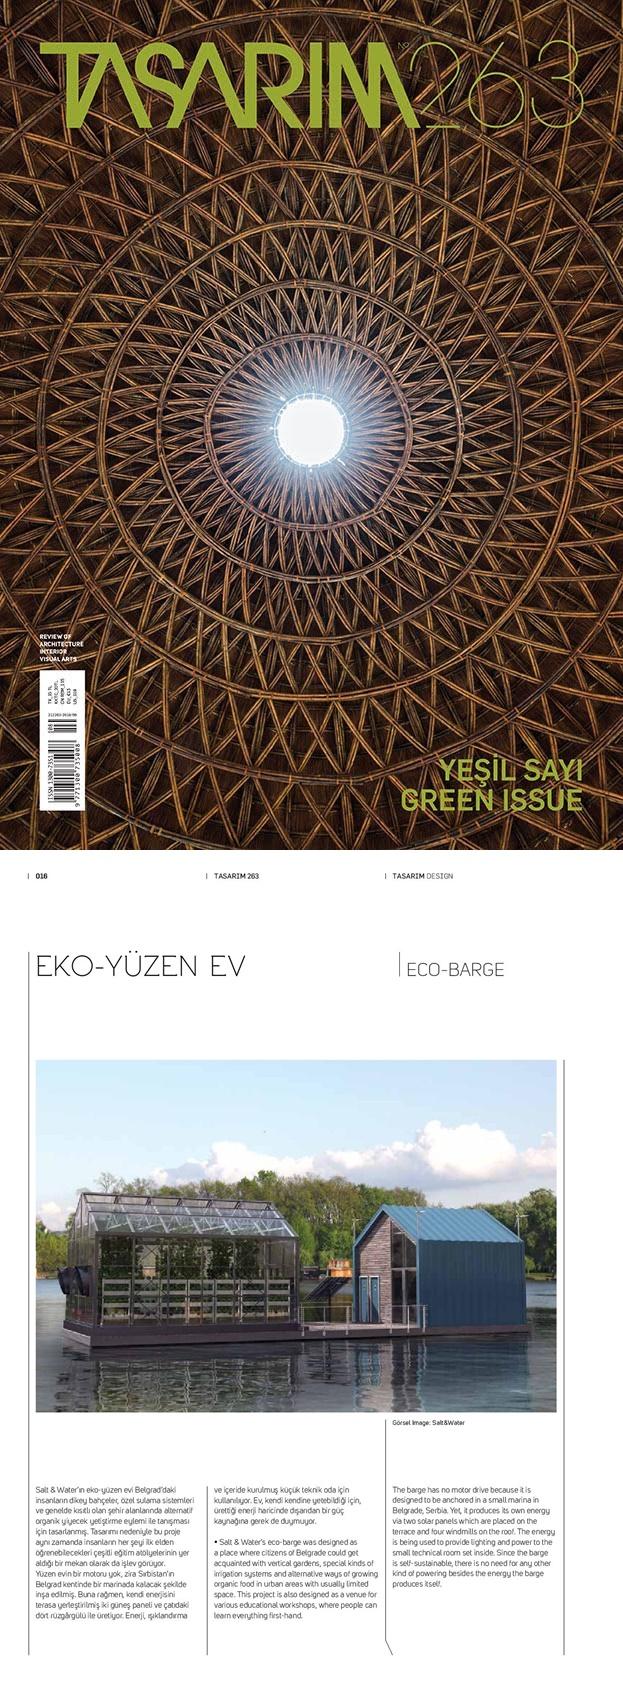 Tasarim magazine